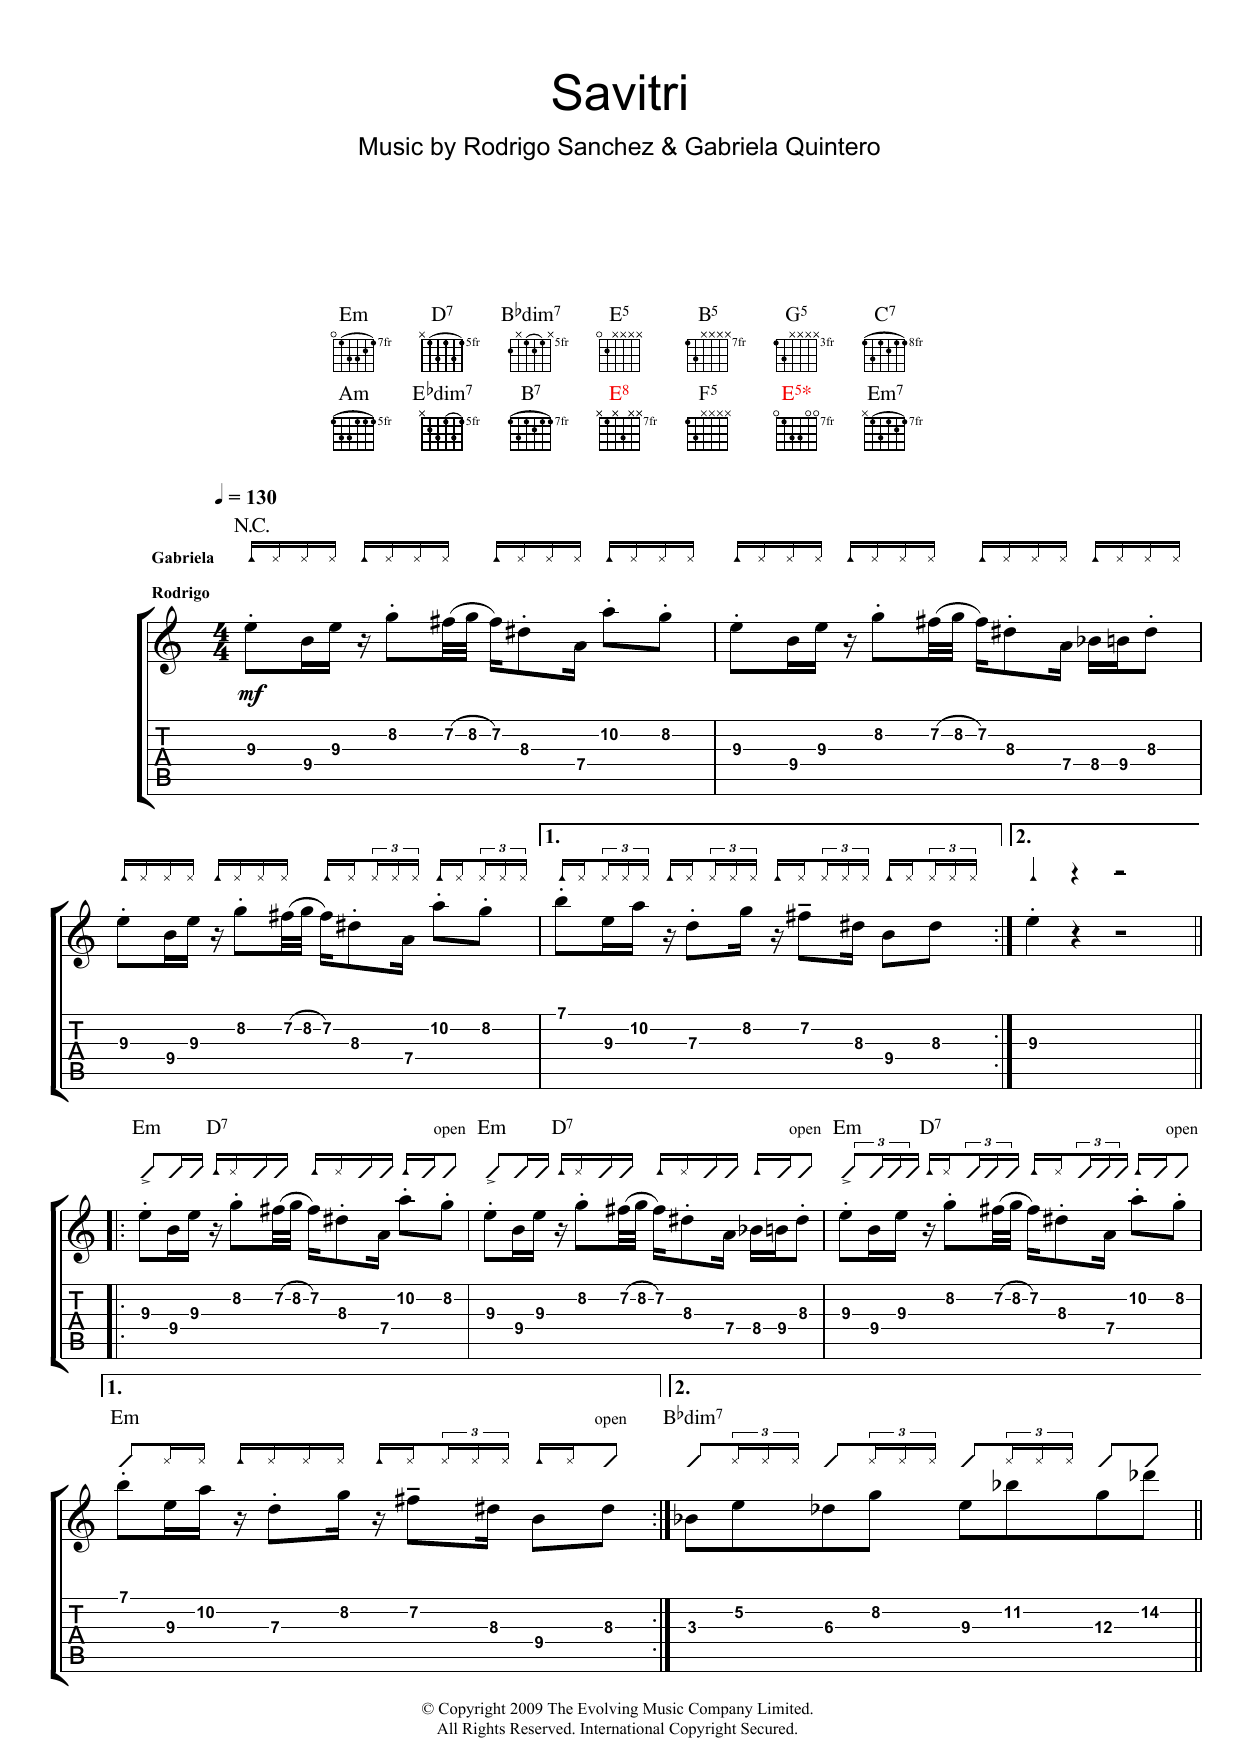 Savitri sheet music